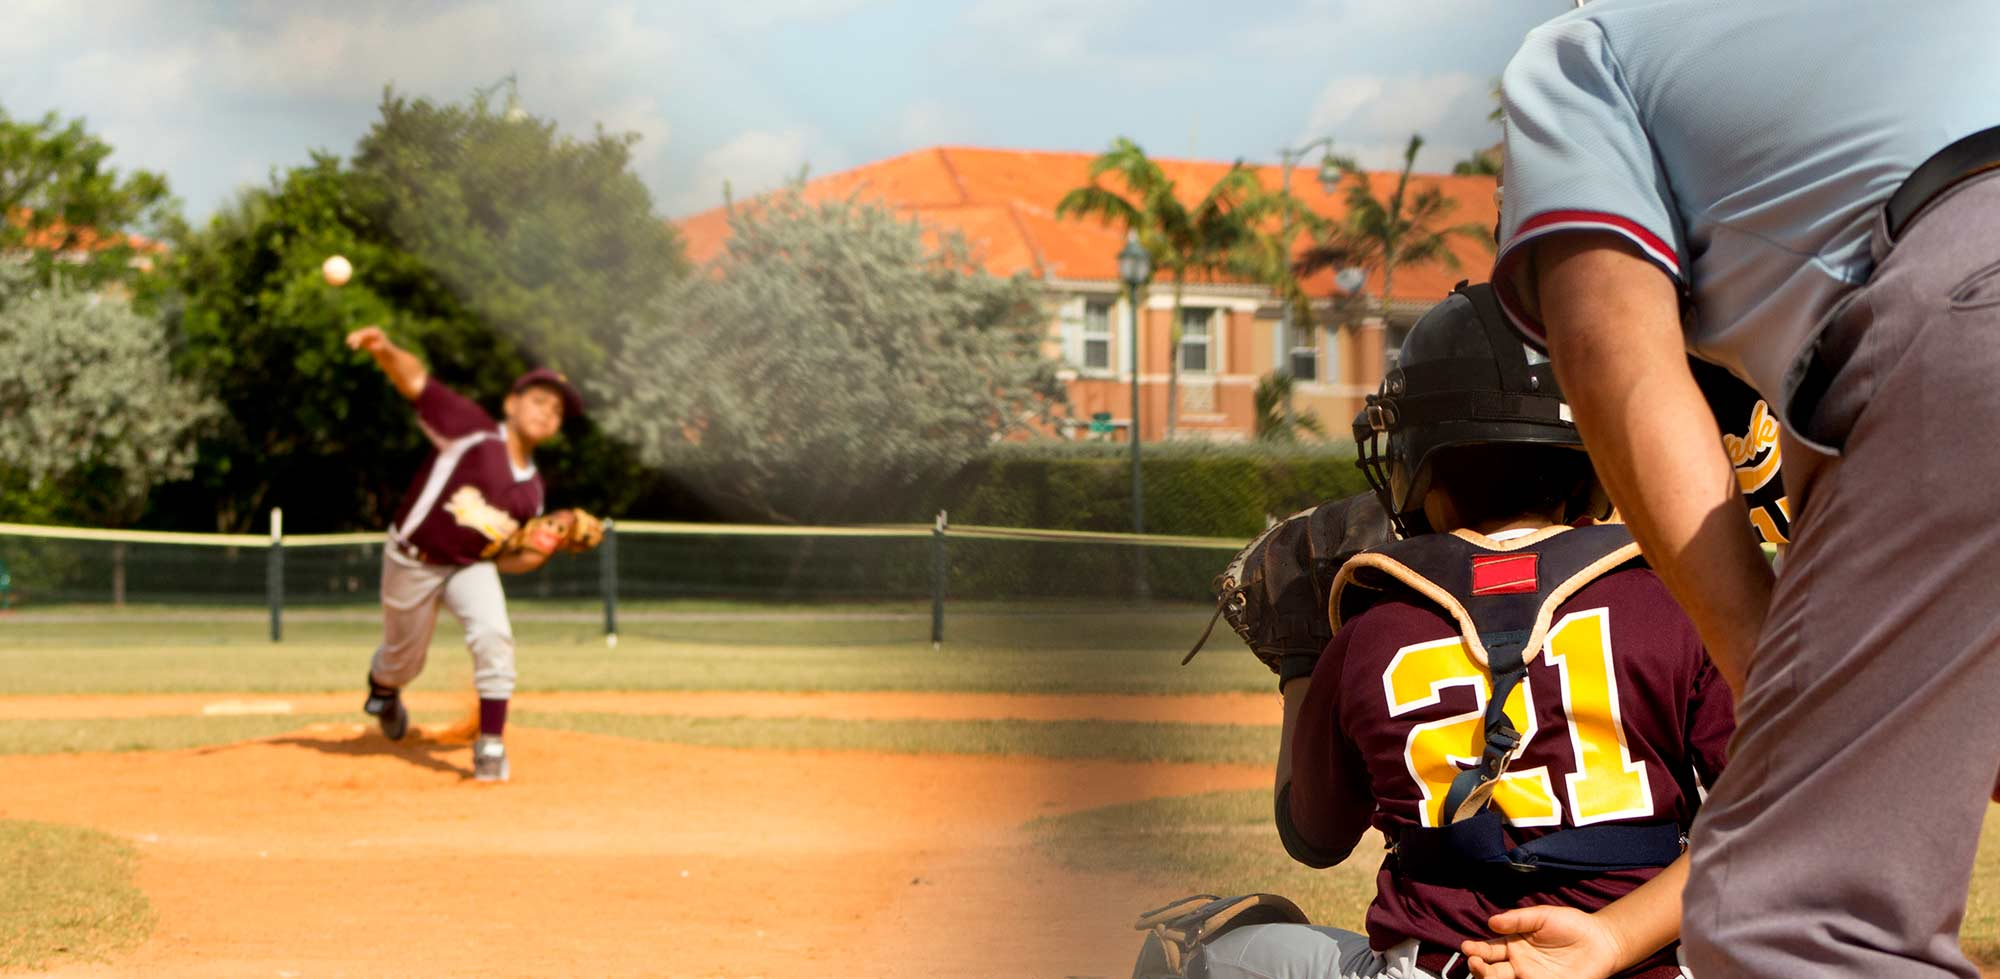 Baseball Private Lessons in Delaware